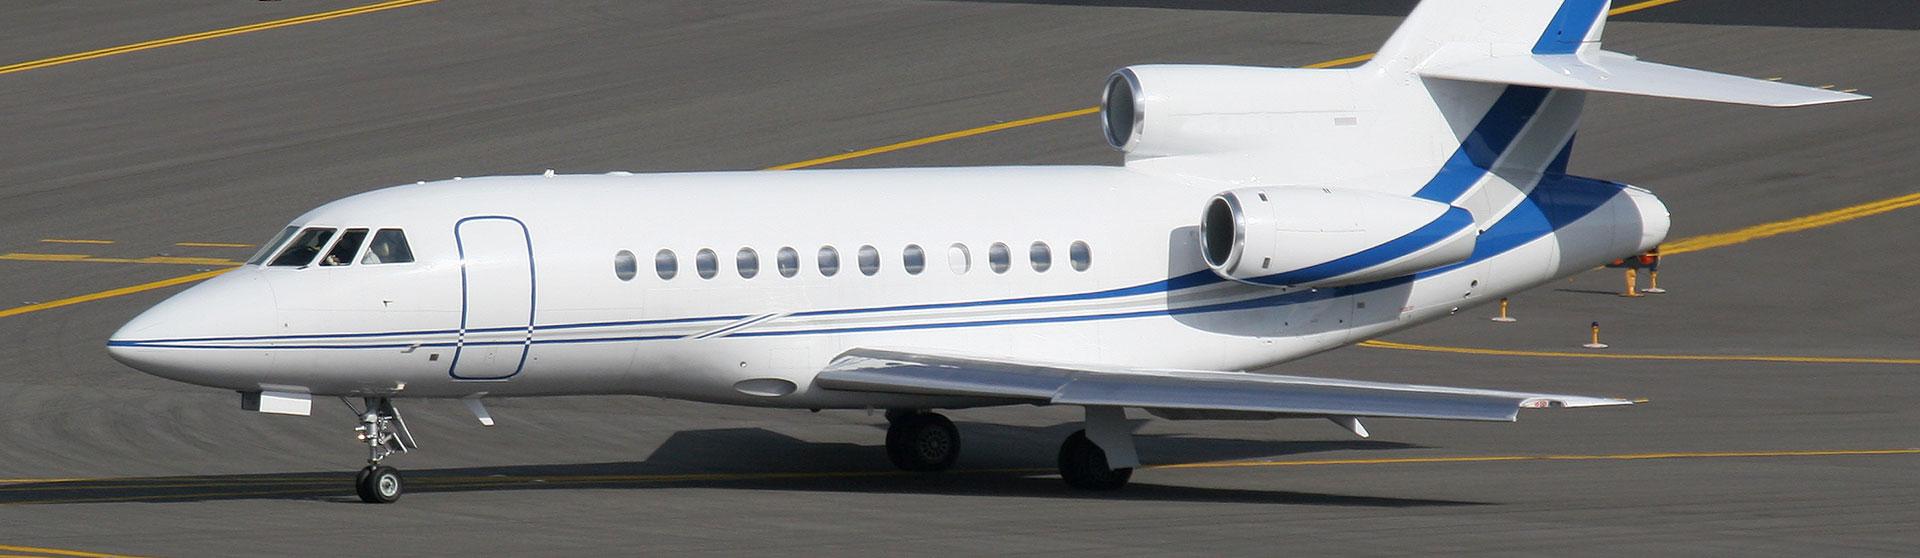 Honeywell GTCP 36 APU Repair & Overhaul Services - Dallas